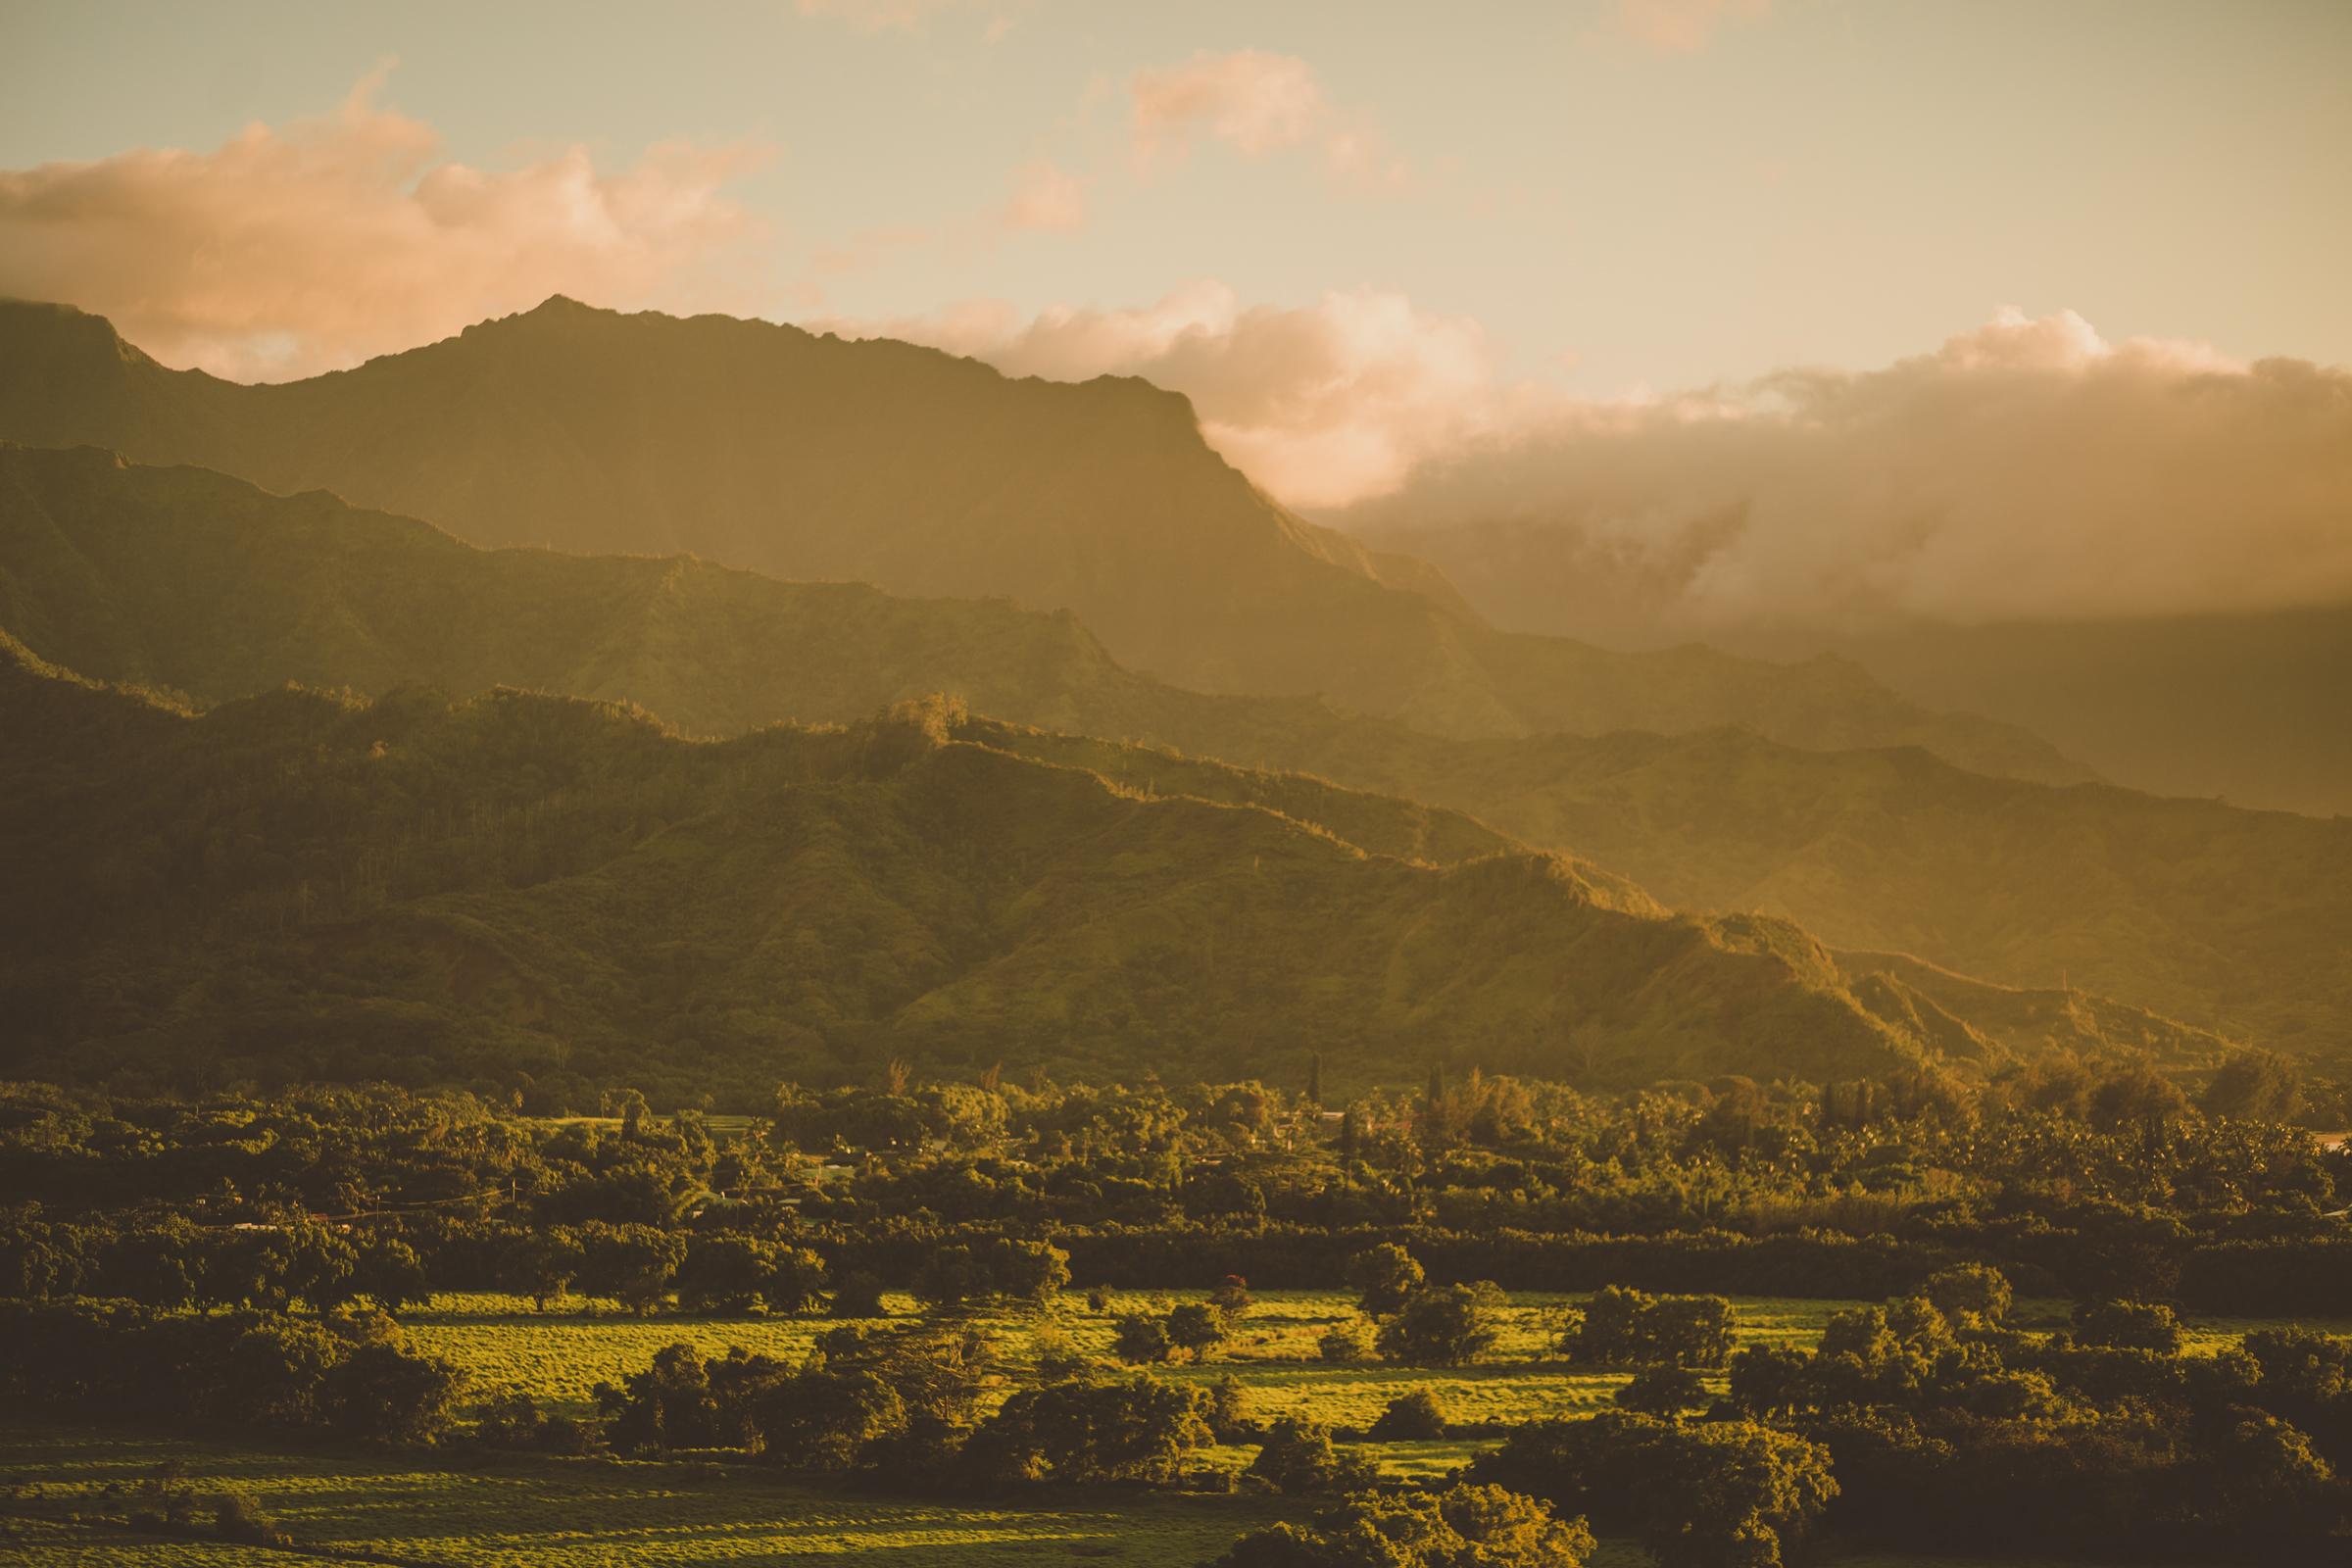 IMG_2788--KAUAI-HAWAII-JENNIFER-PICARD-PHOTOGRAPHY.jpg